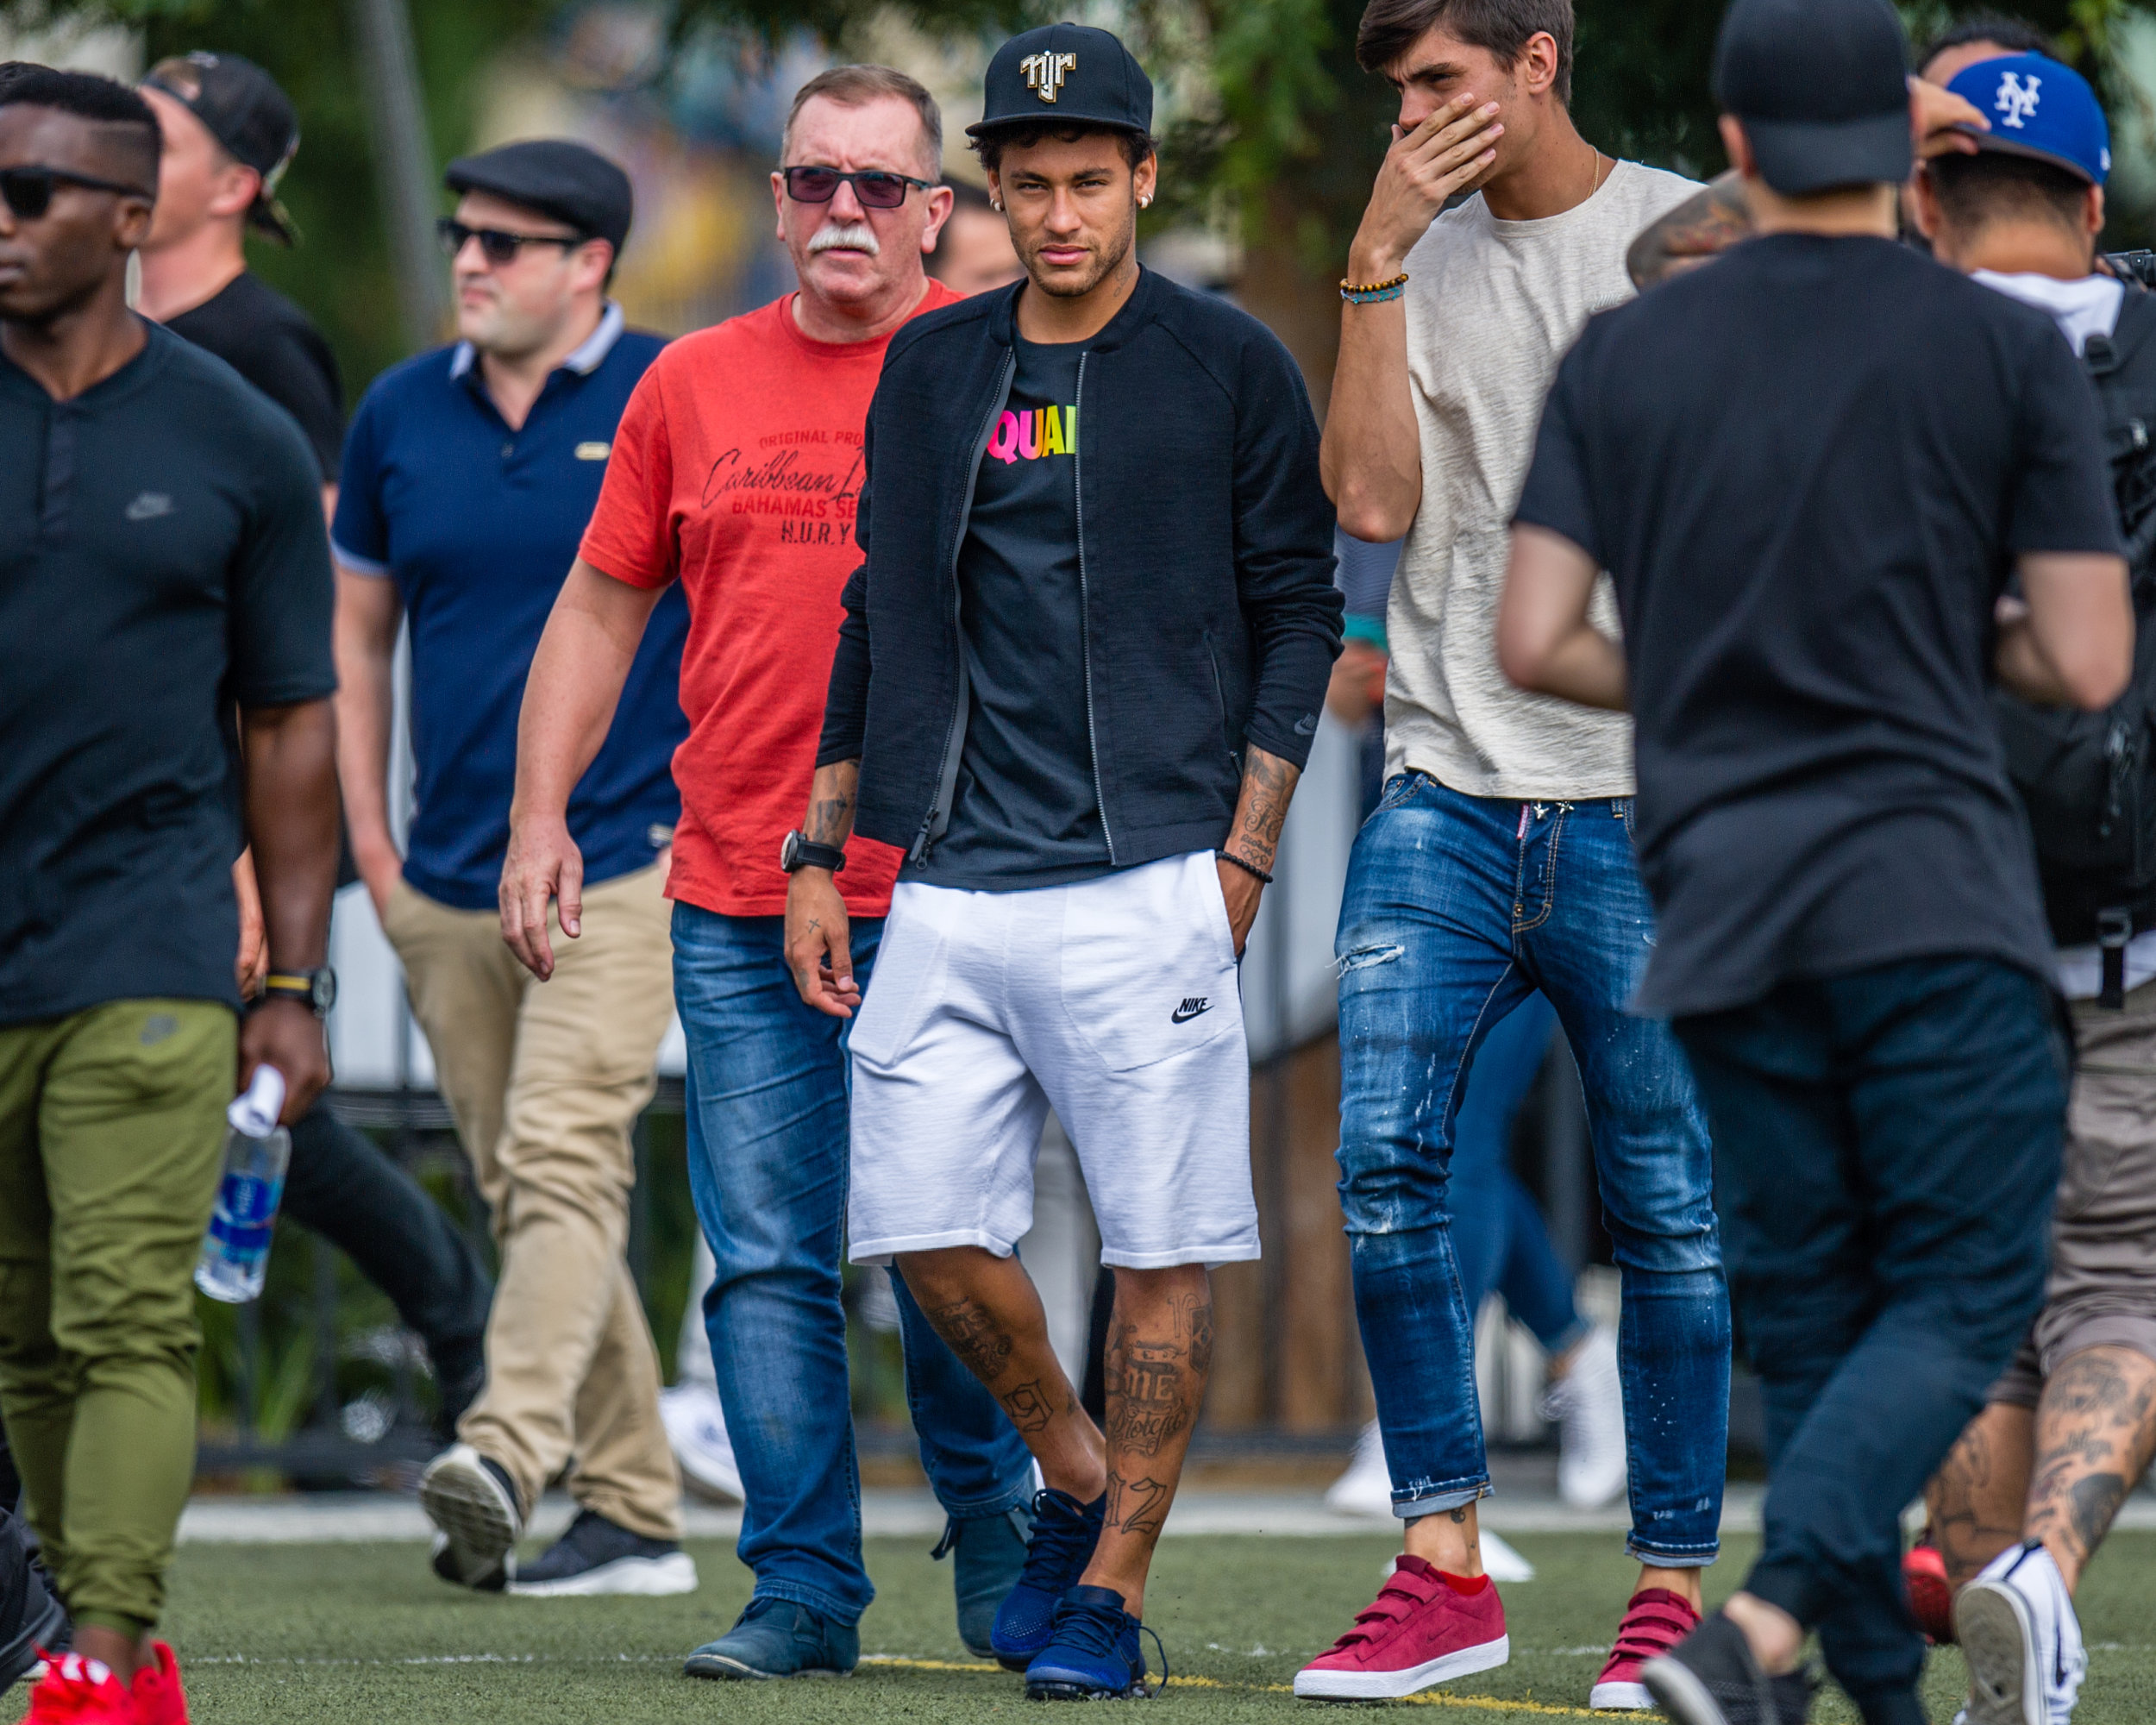 neymar jr in la - neymar x vbfc